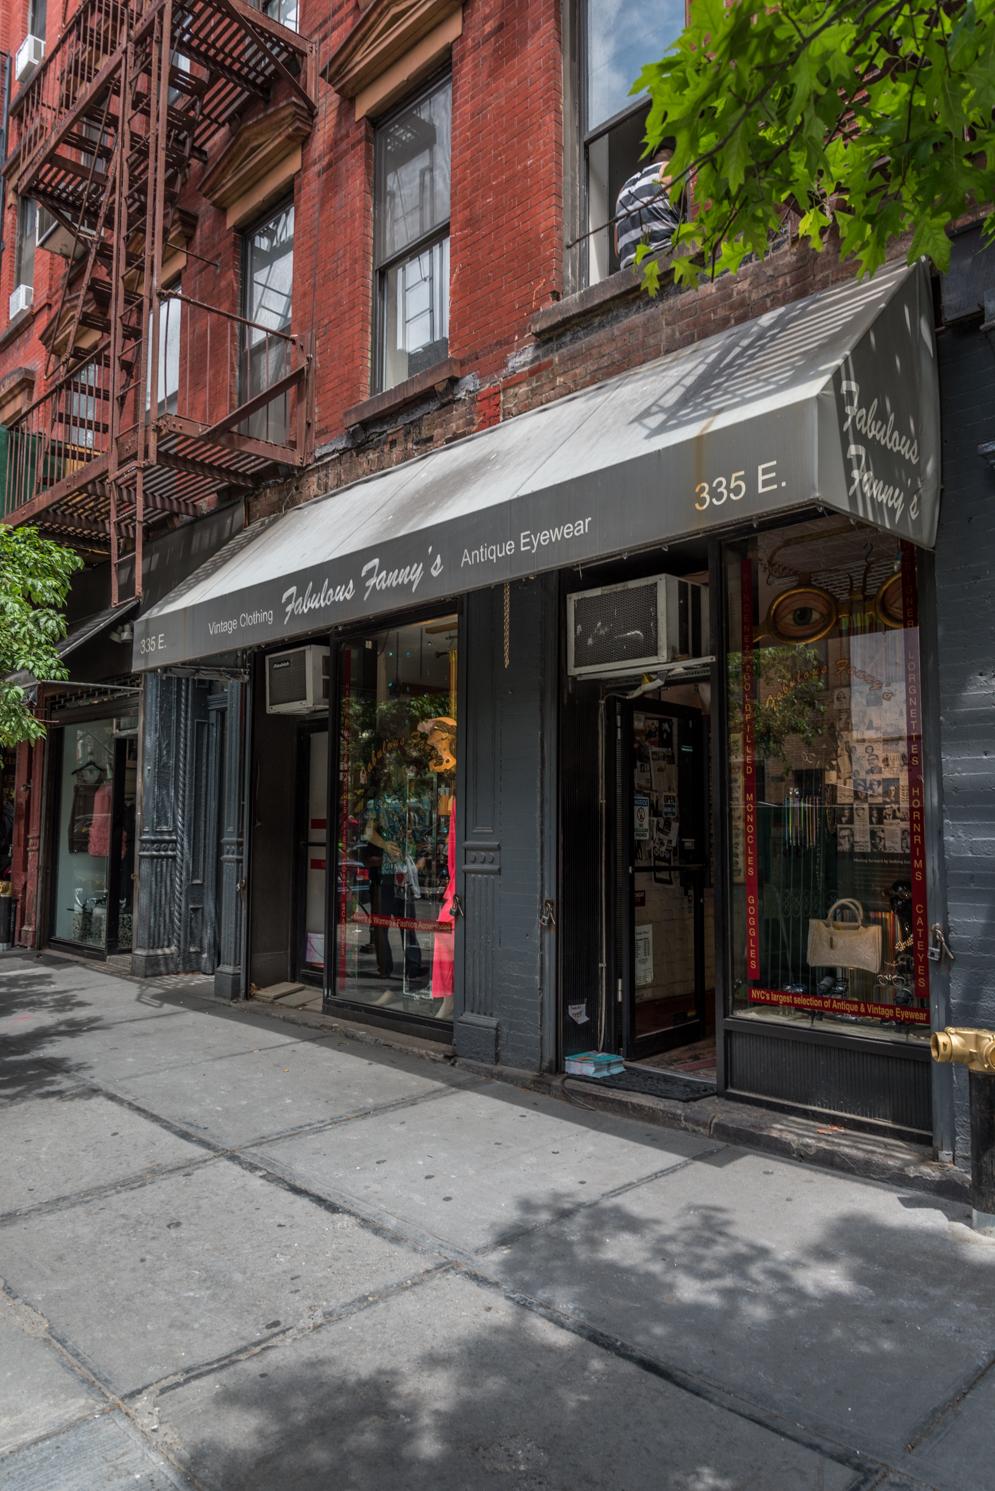 ROCK MAMA NYC LIFESTYLE BLOG - EAST VILLAGE VINTAGE EYEWEAR STORE - FABULOUS FANNYS